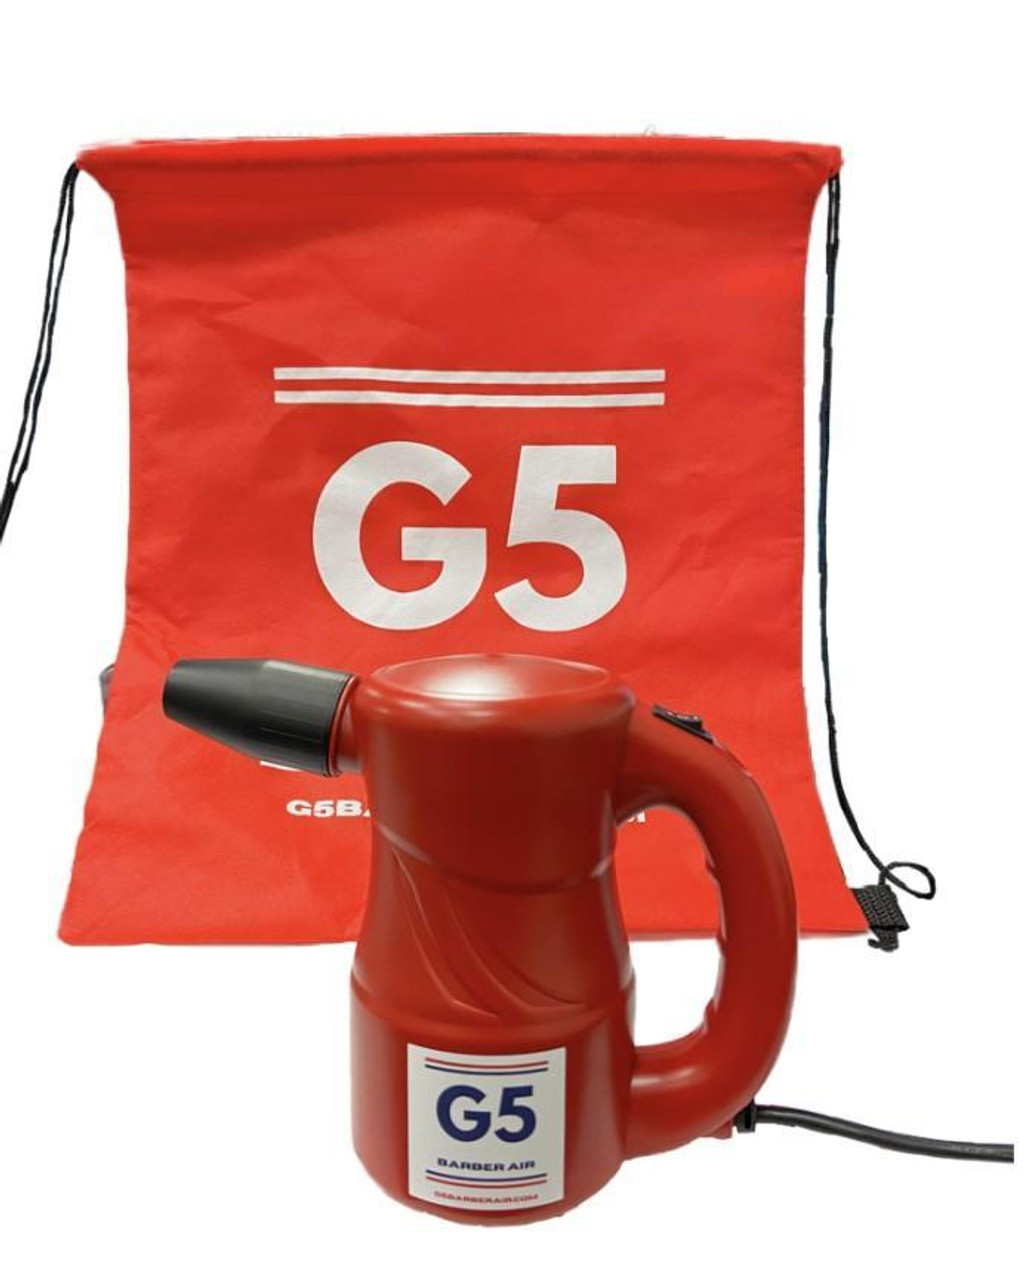 G5 Barber Air